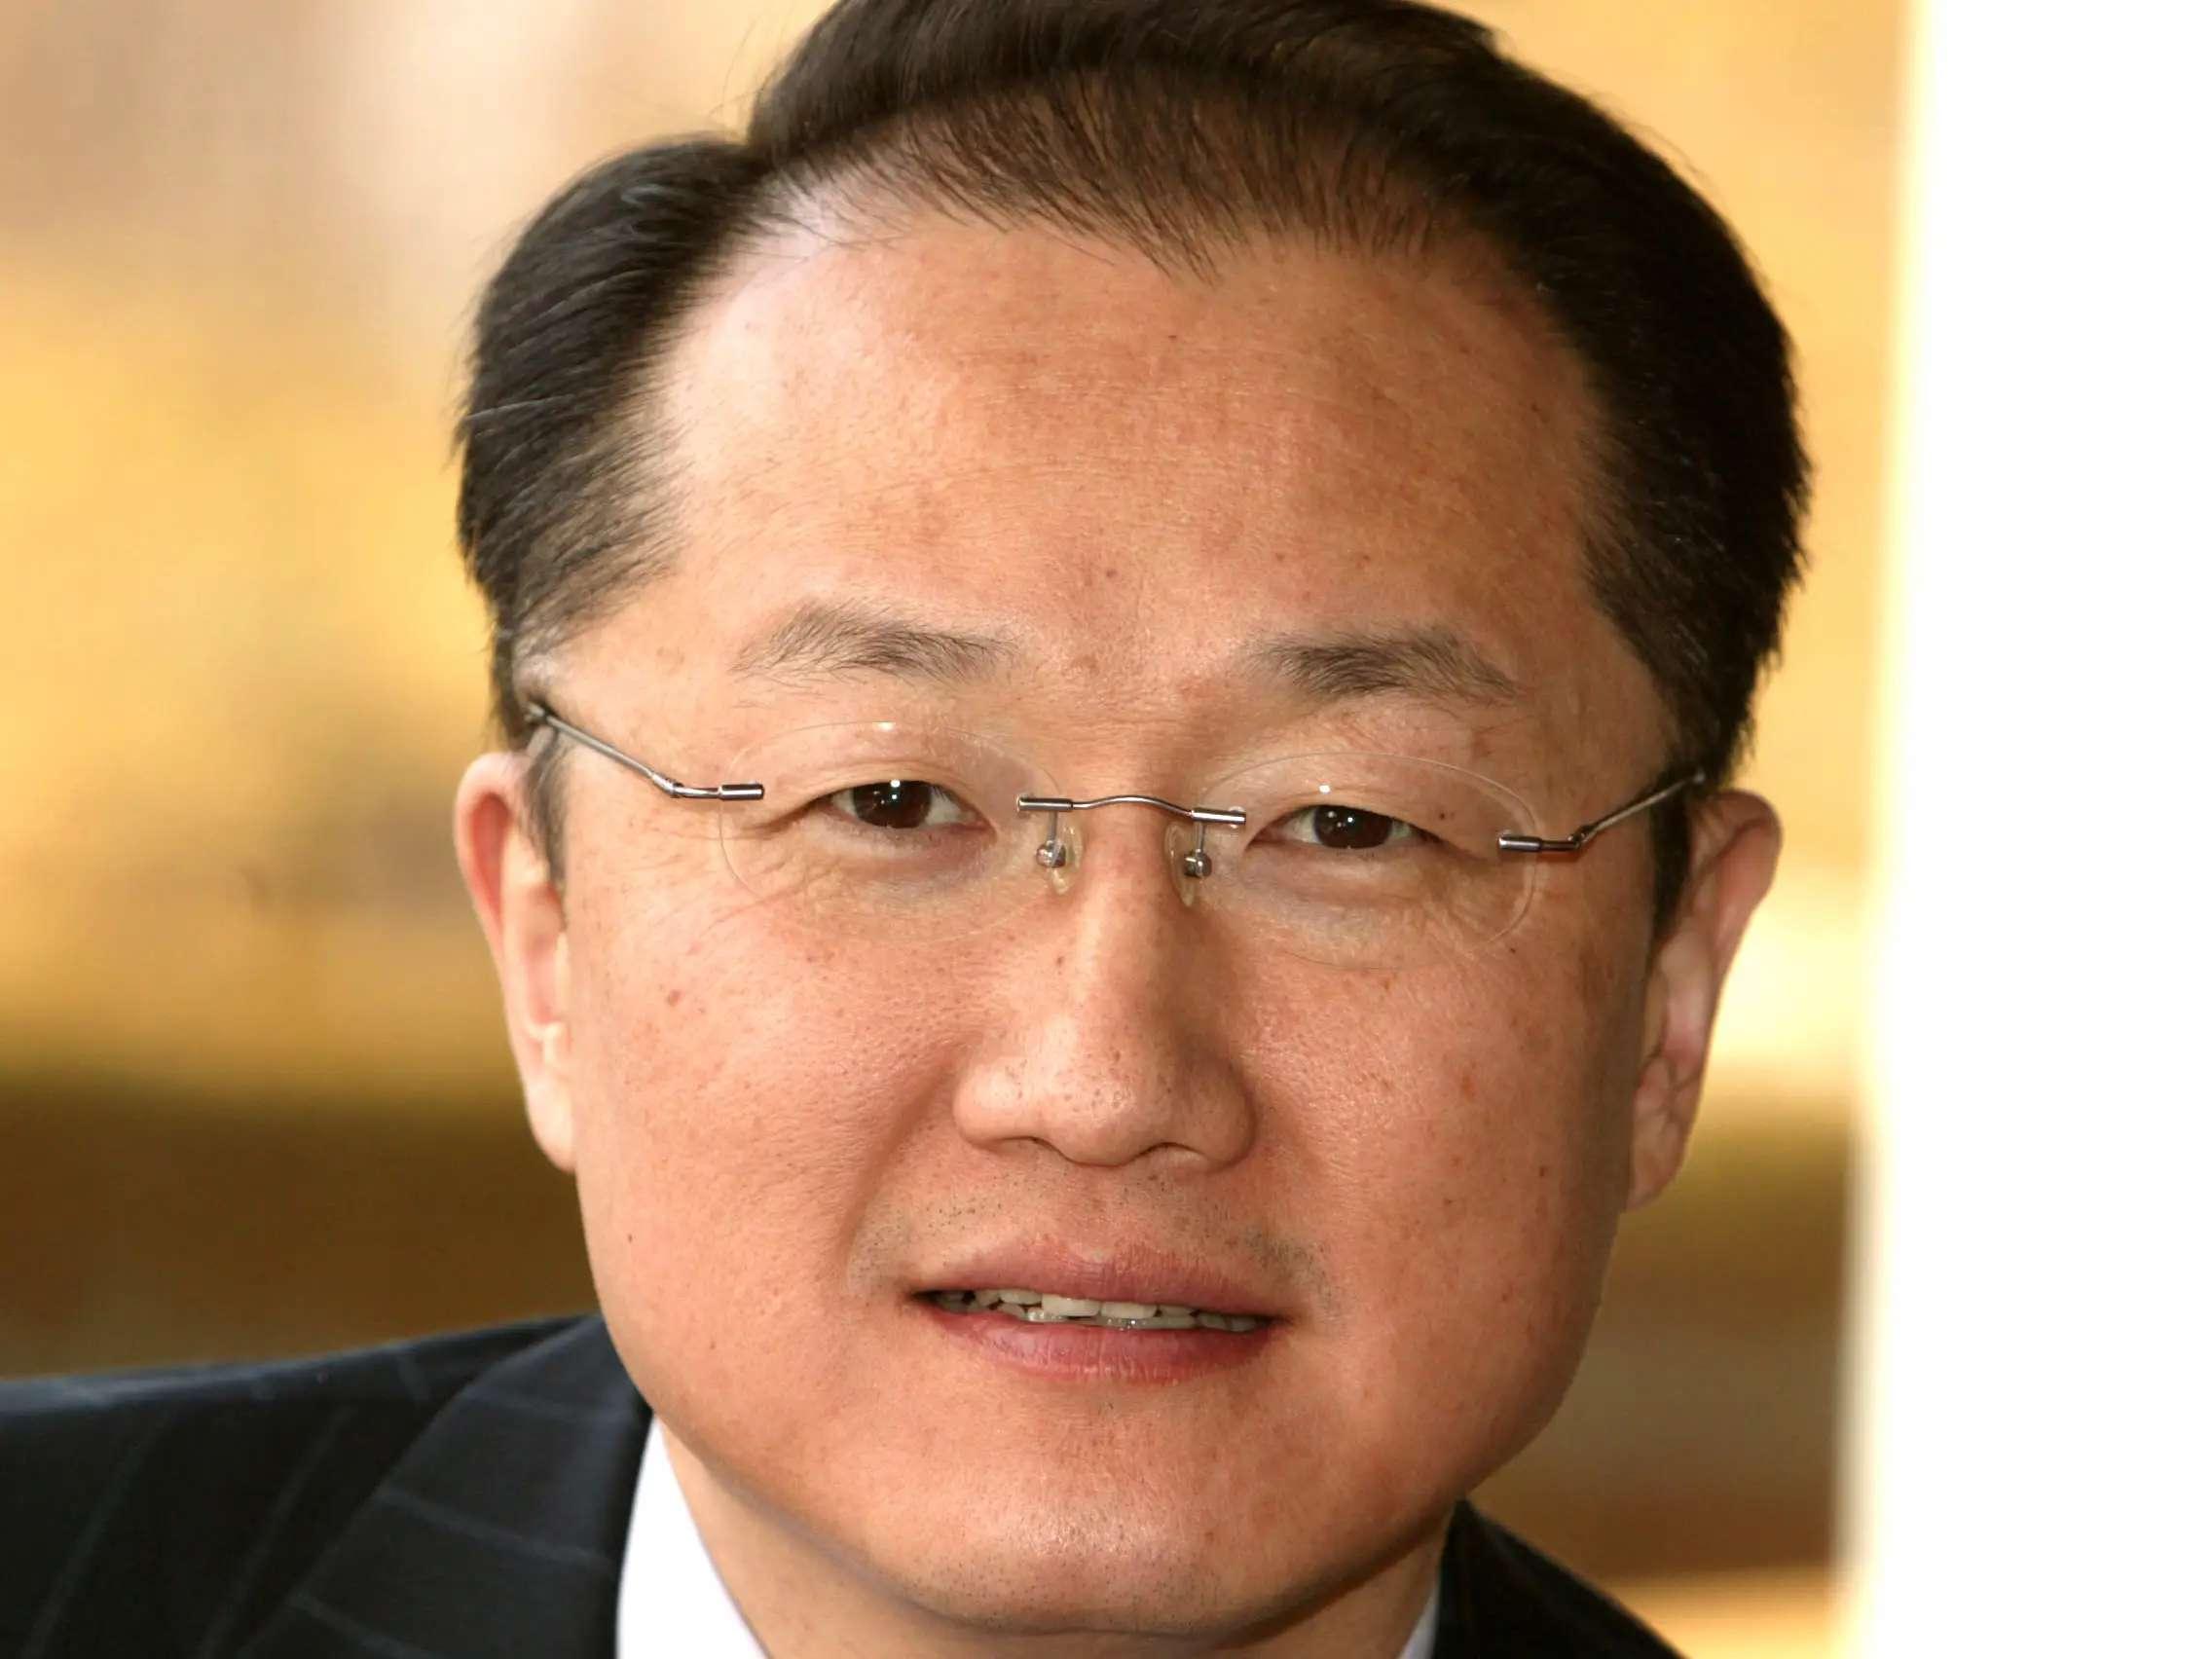 Jim Kim, President at The World Bank